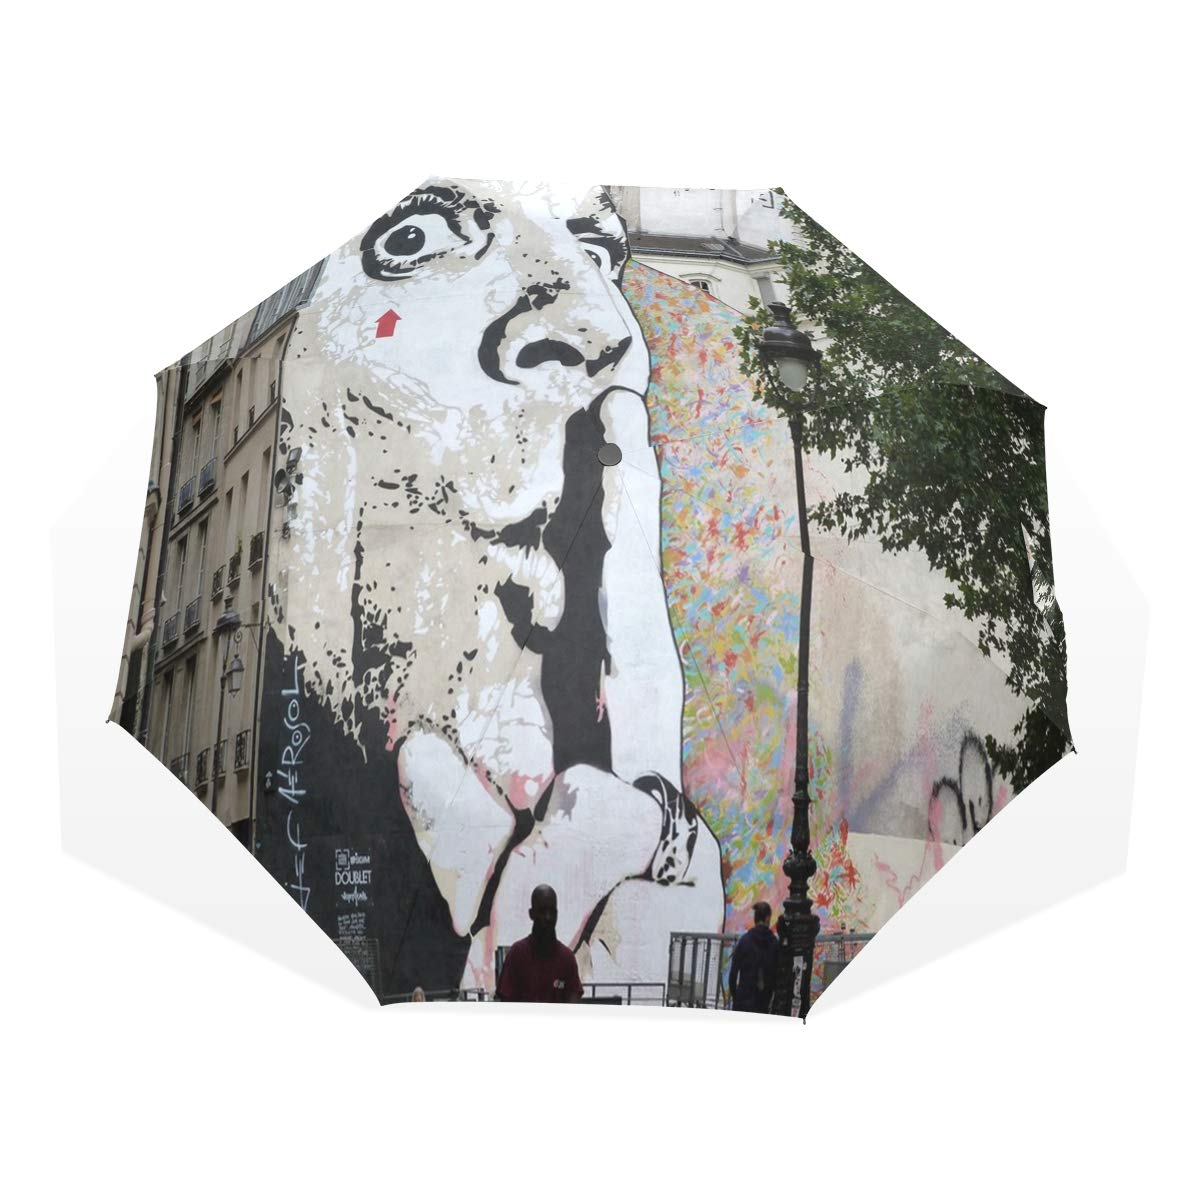 HangWang 傘 ユリのPulitzer 旅行 ゴルフ 太陽 雨 防風 傘 UV保護 子供 女の子 男の子 B07NRSG63Y パターン2 37.8\